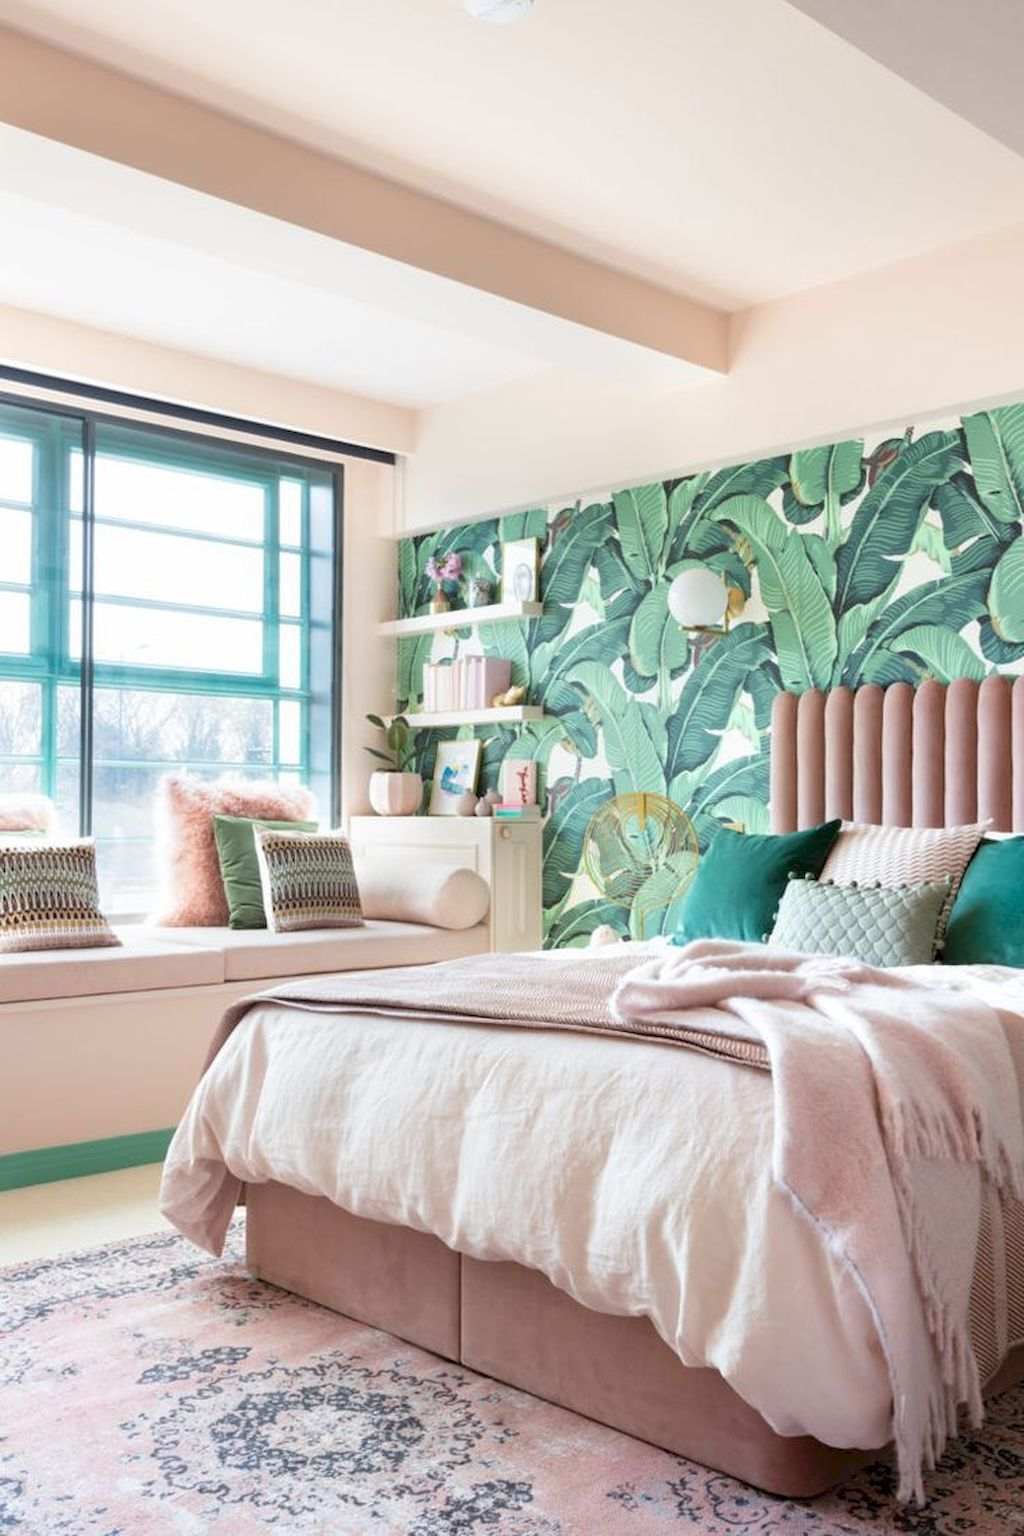 Bed room Wall Decor - Enjoyable Step For Your Distinctive Model en